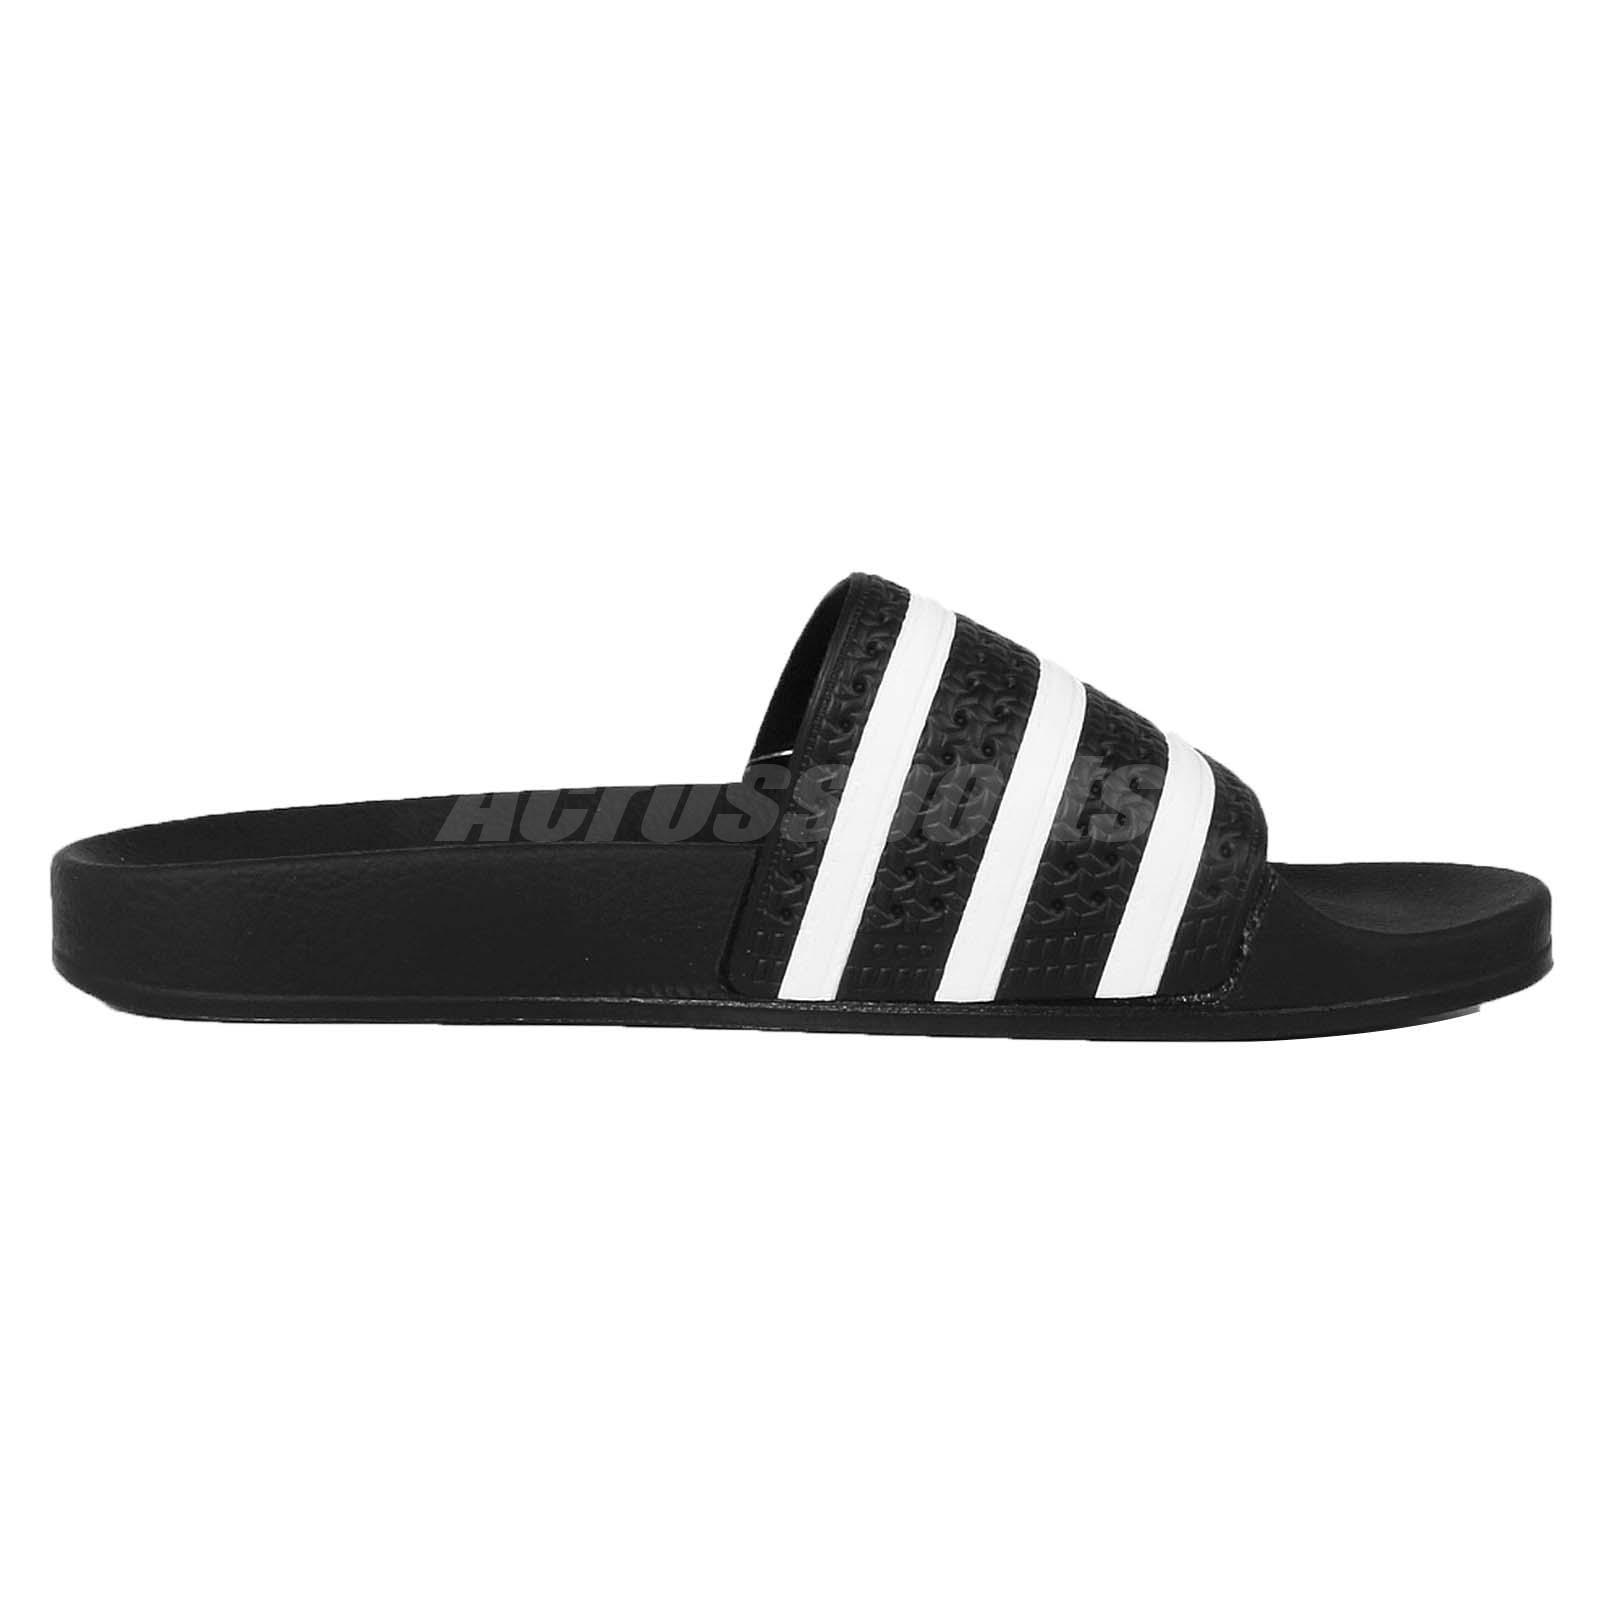 4eb69ba8383b adidas Performance Adilette Black White Men Sports Sandal Slide ...